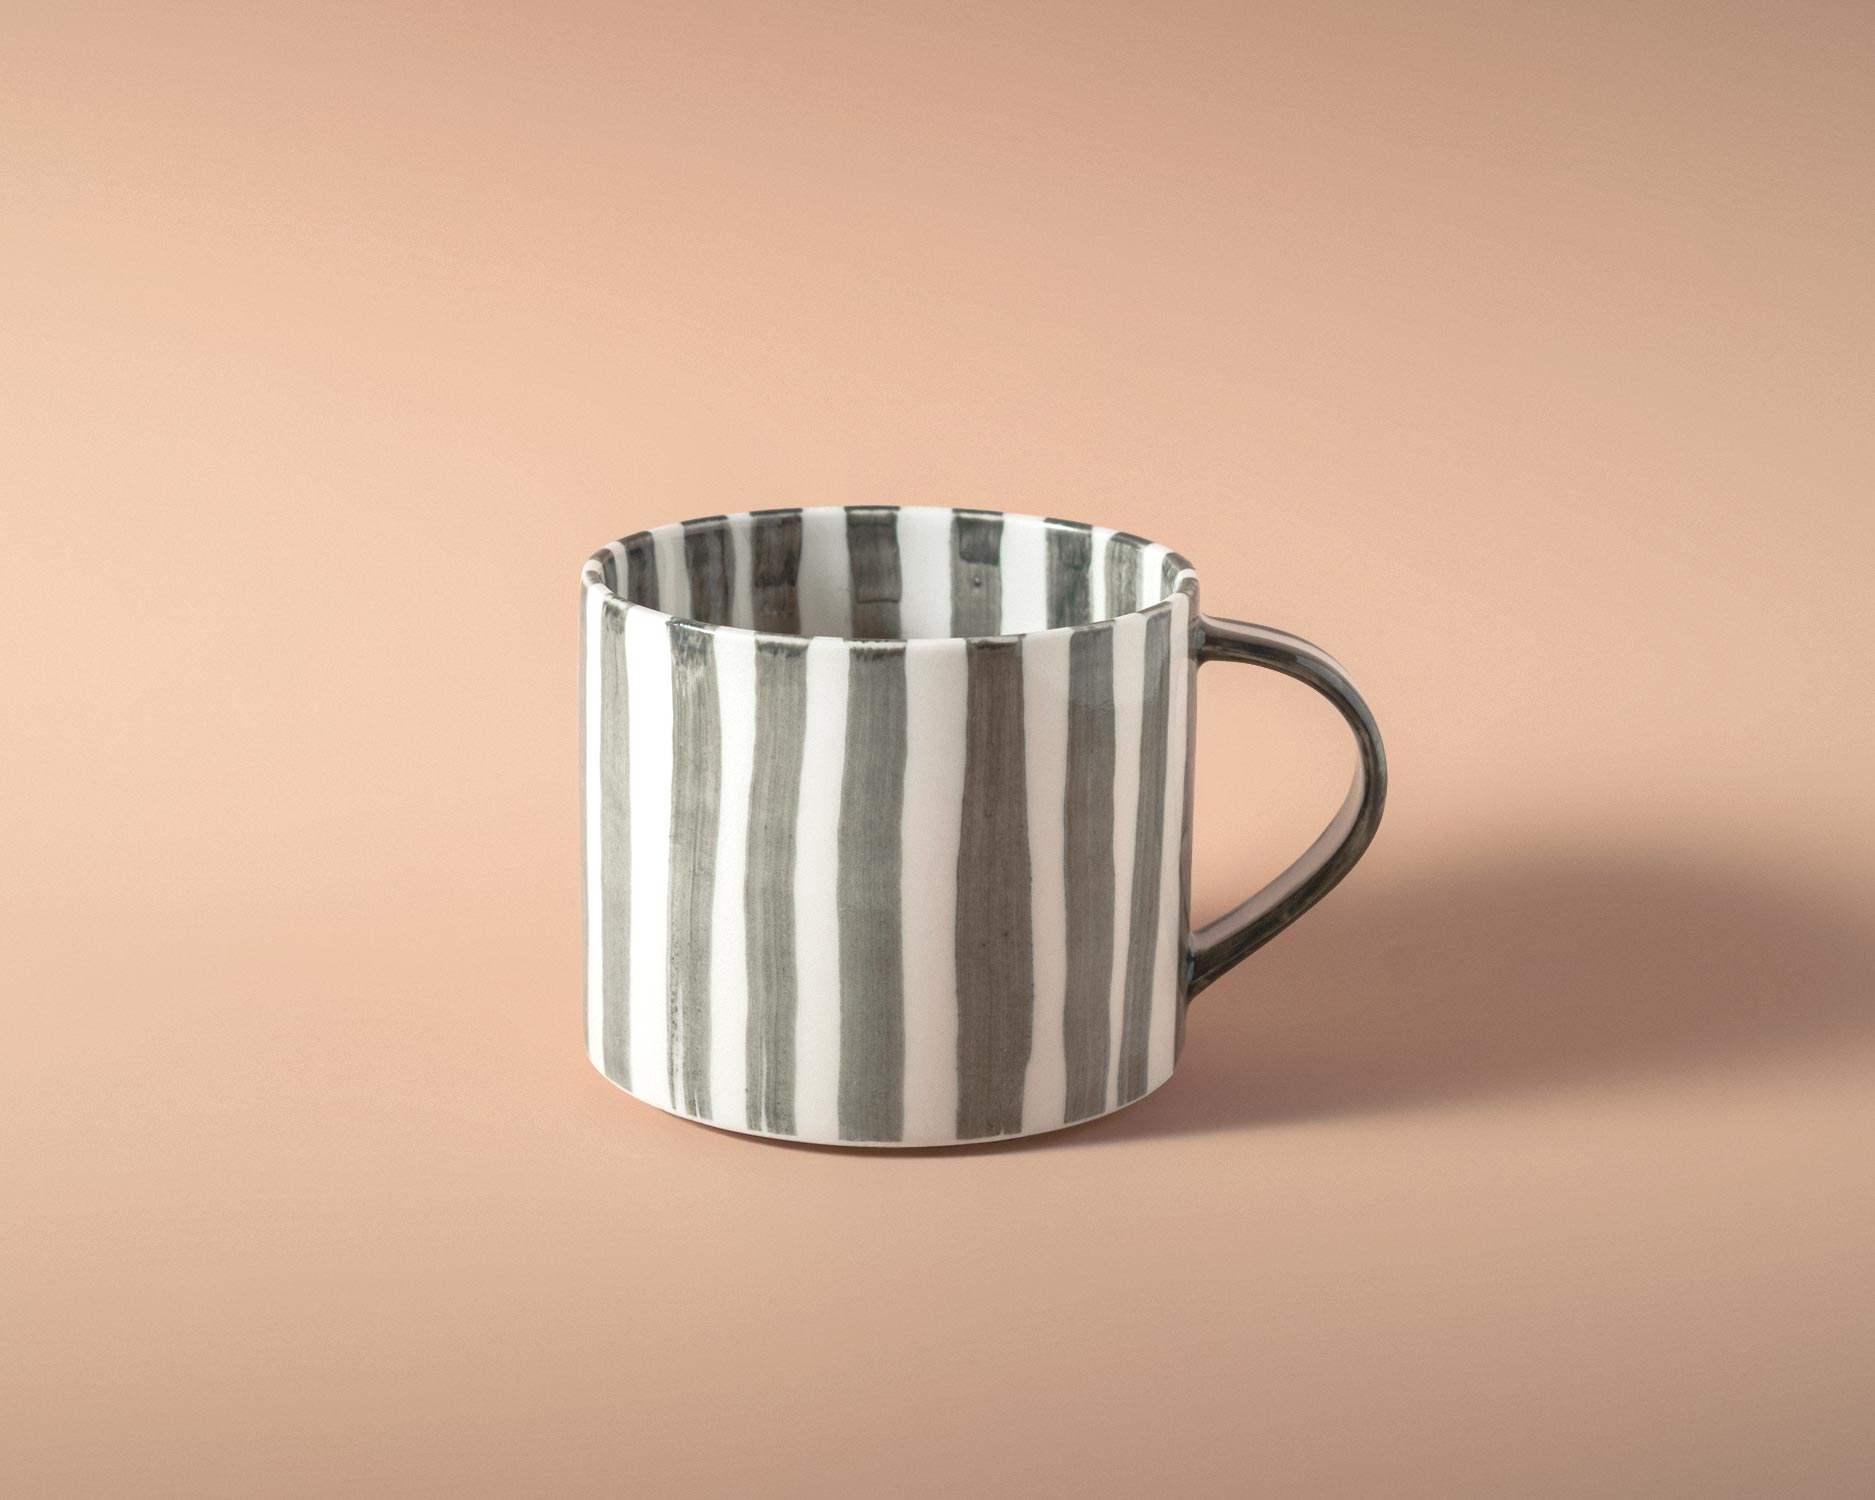 kalligrafi-tea-cup-gray-pp-5.jpg